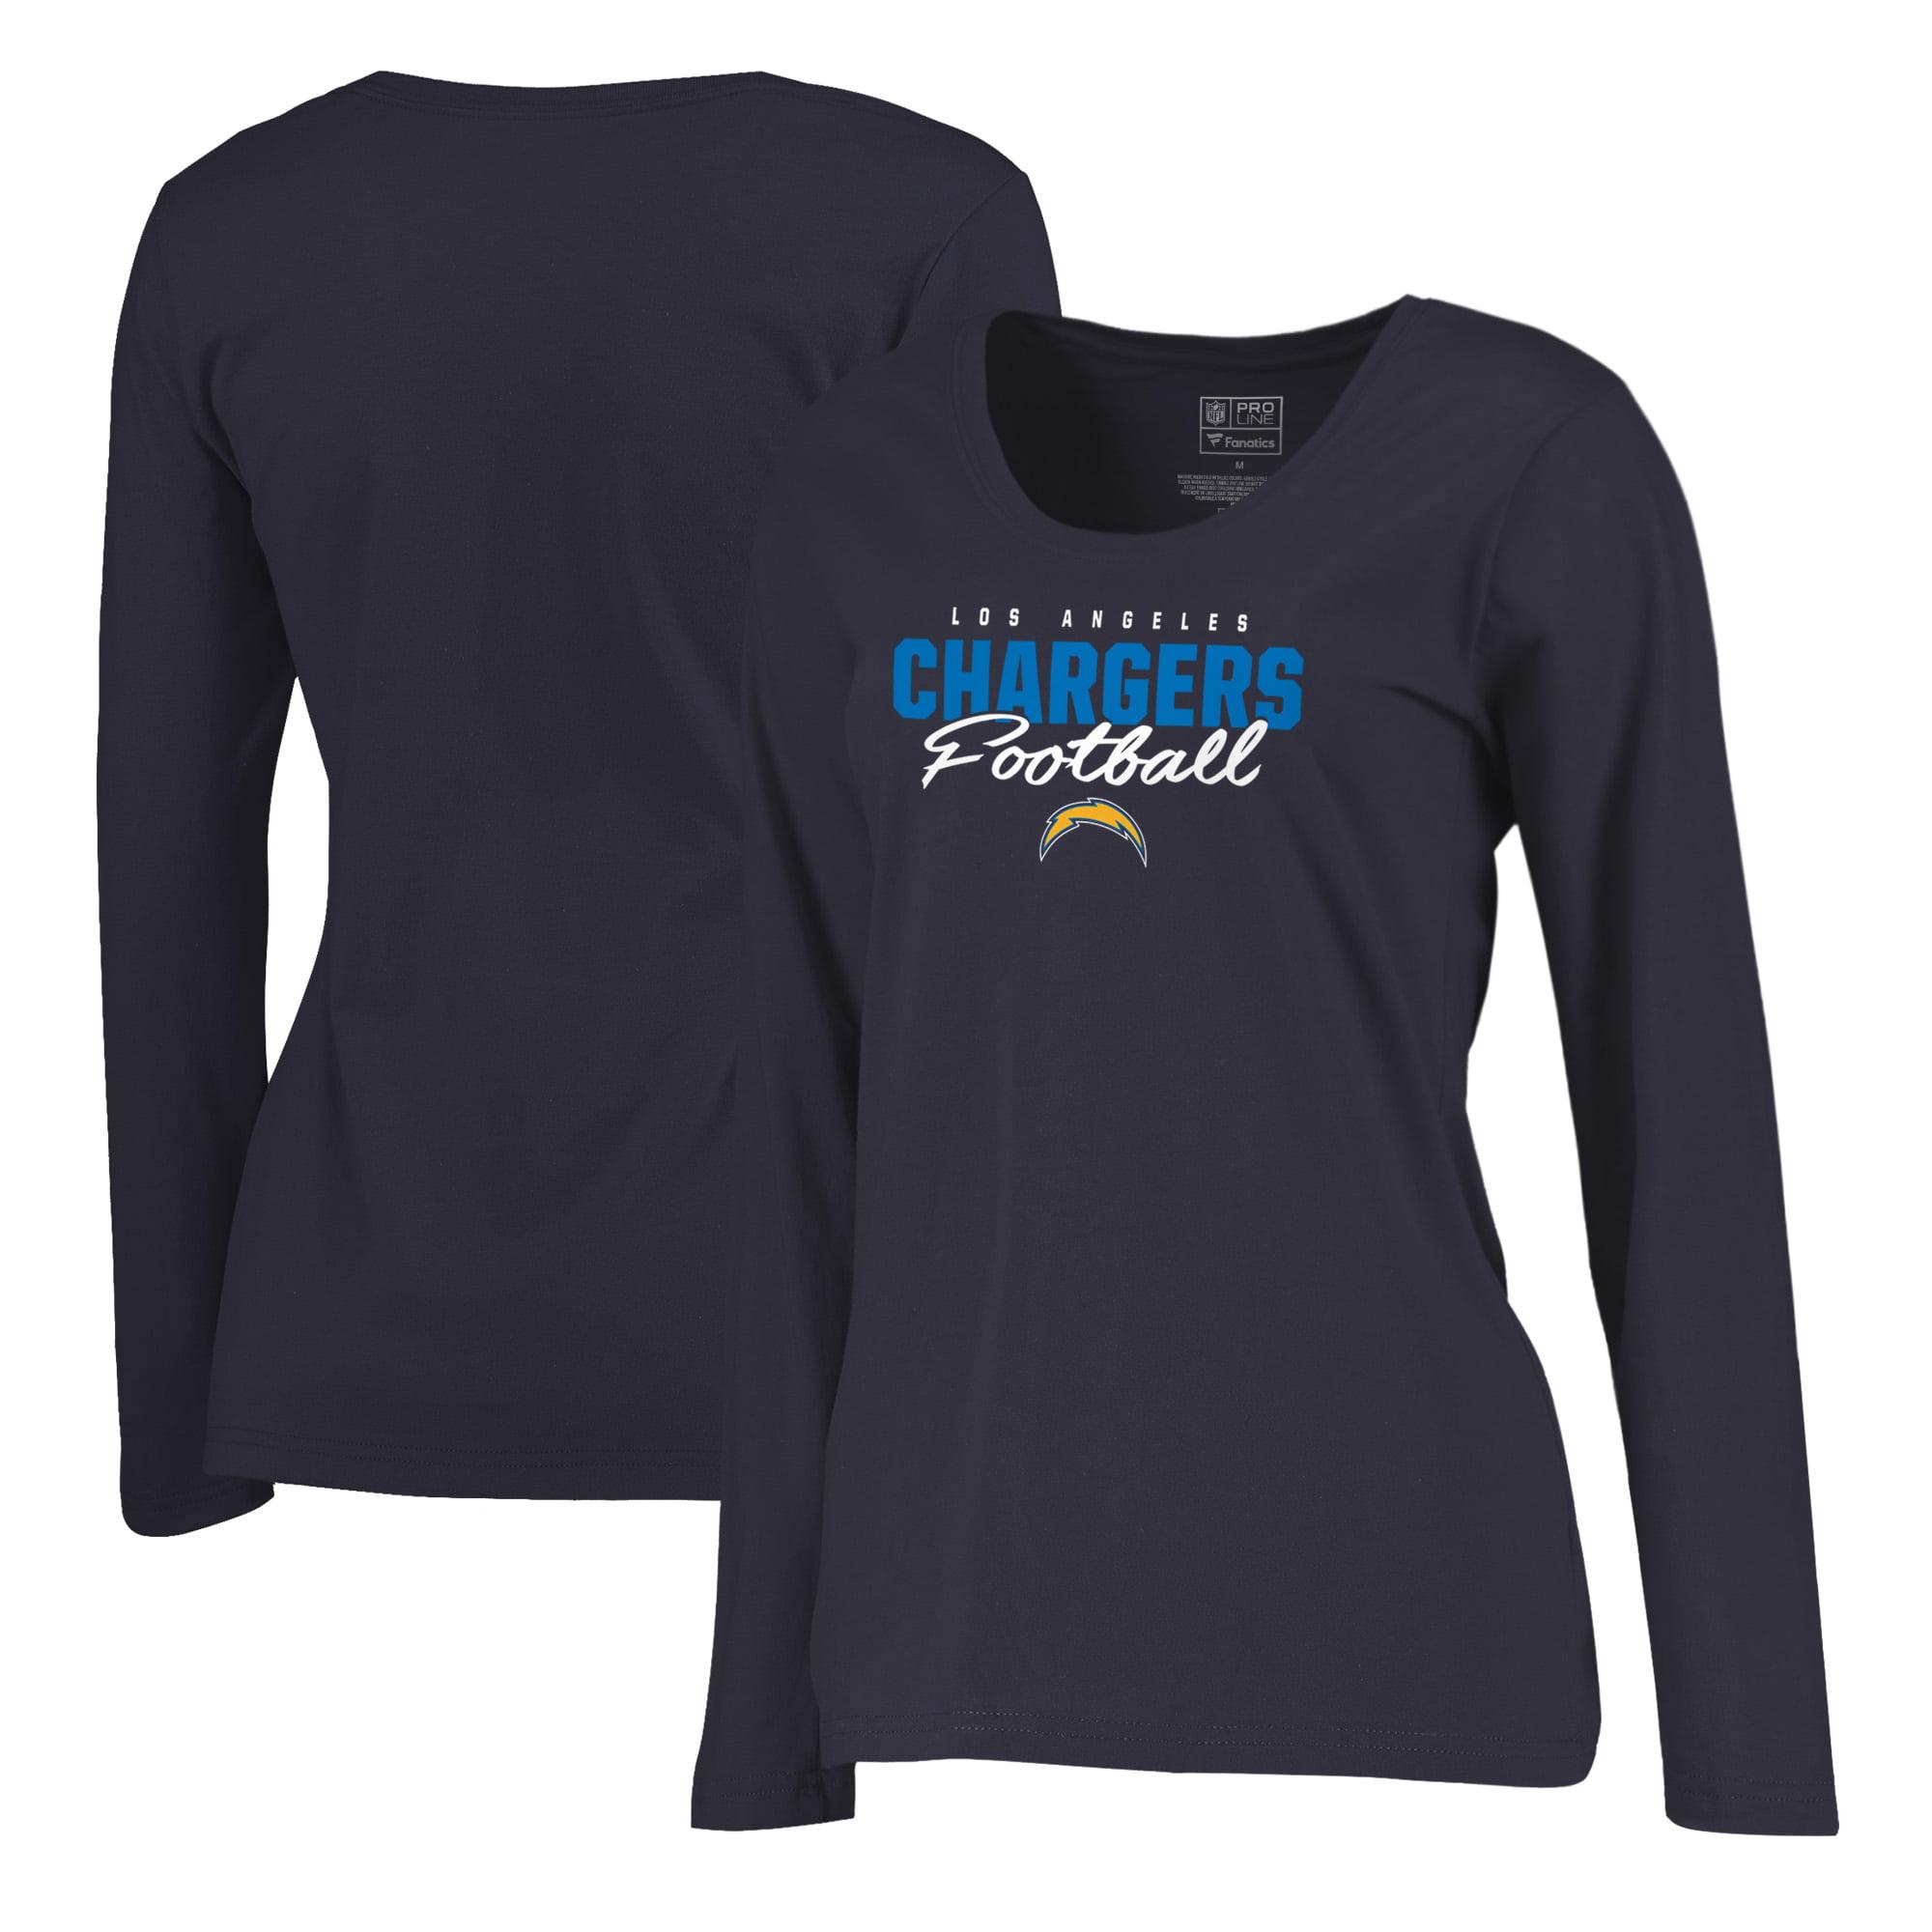 Los Angeles Chargers NFL Pro Line by Fanatics Branded Women s Iconic  Collection Script Assist Plus Size Long Sleeve T-Shirt - Navy - Walmart.com 10ef1ec46